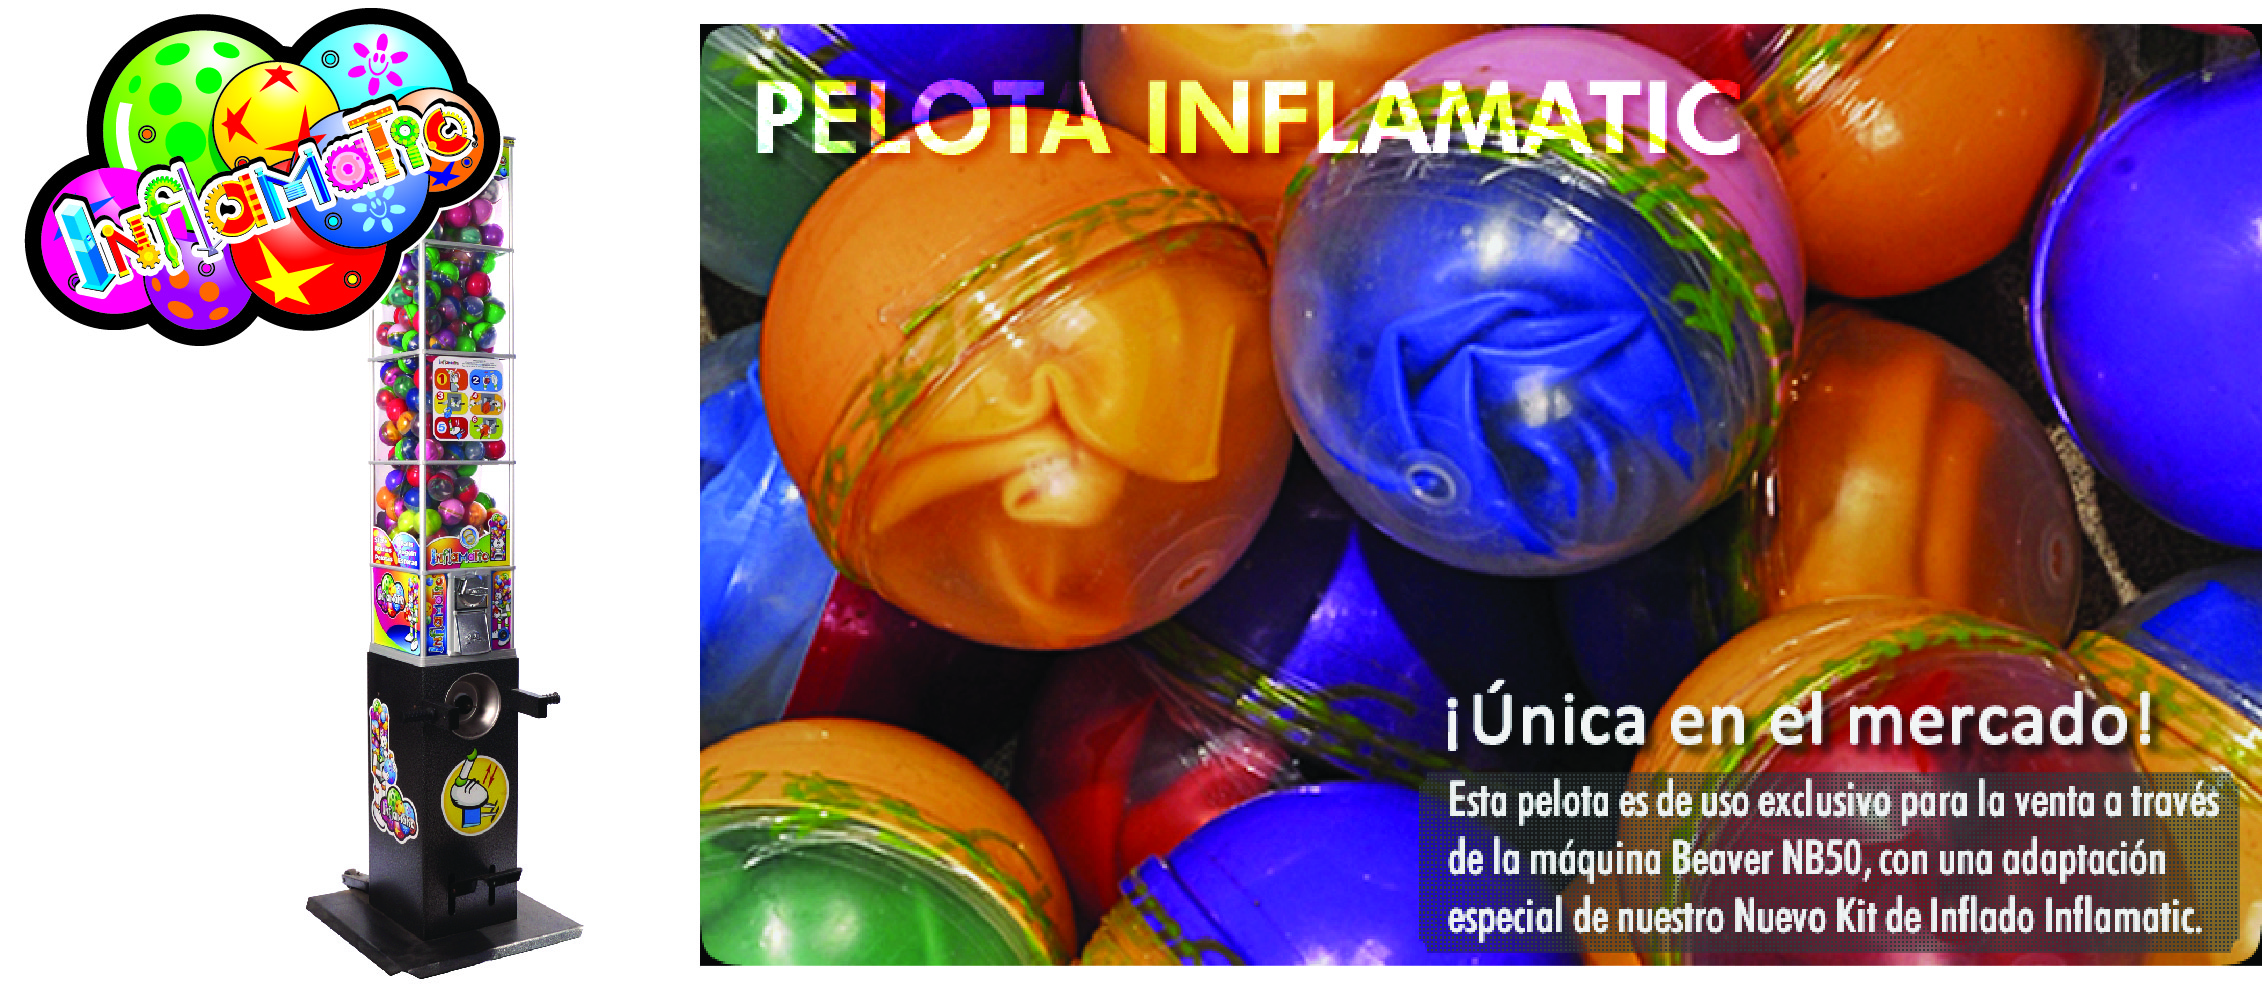 pelota-inflamatic-eco-01.jpg